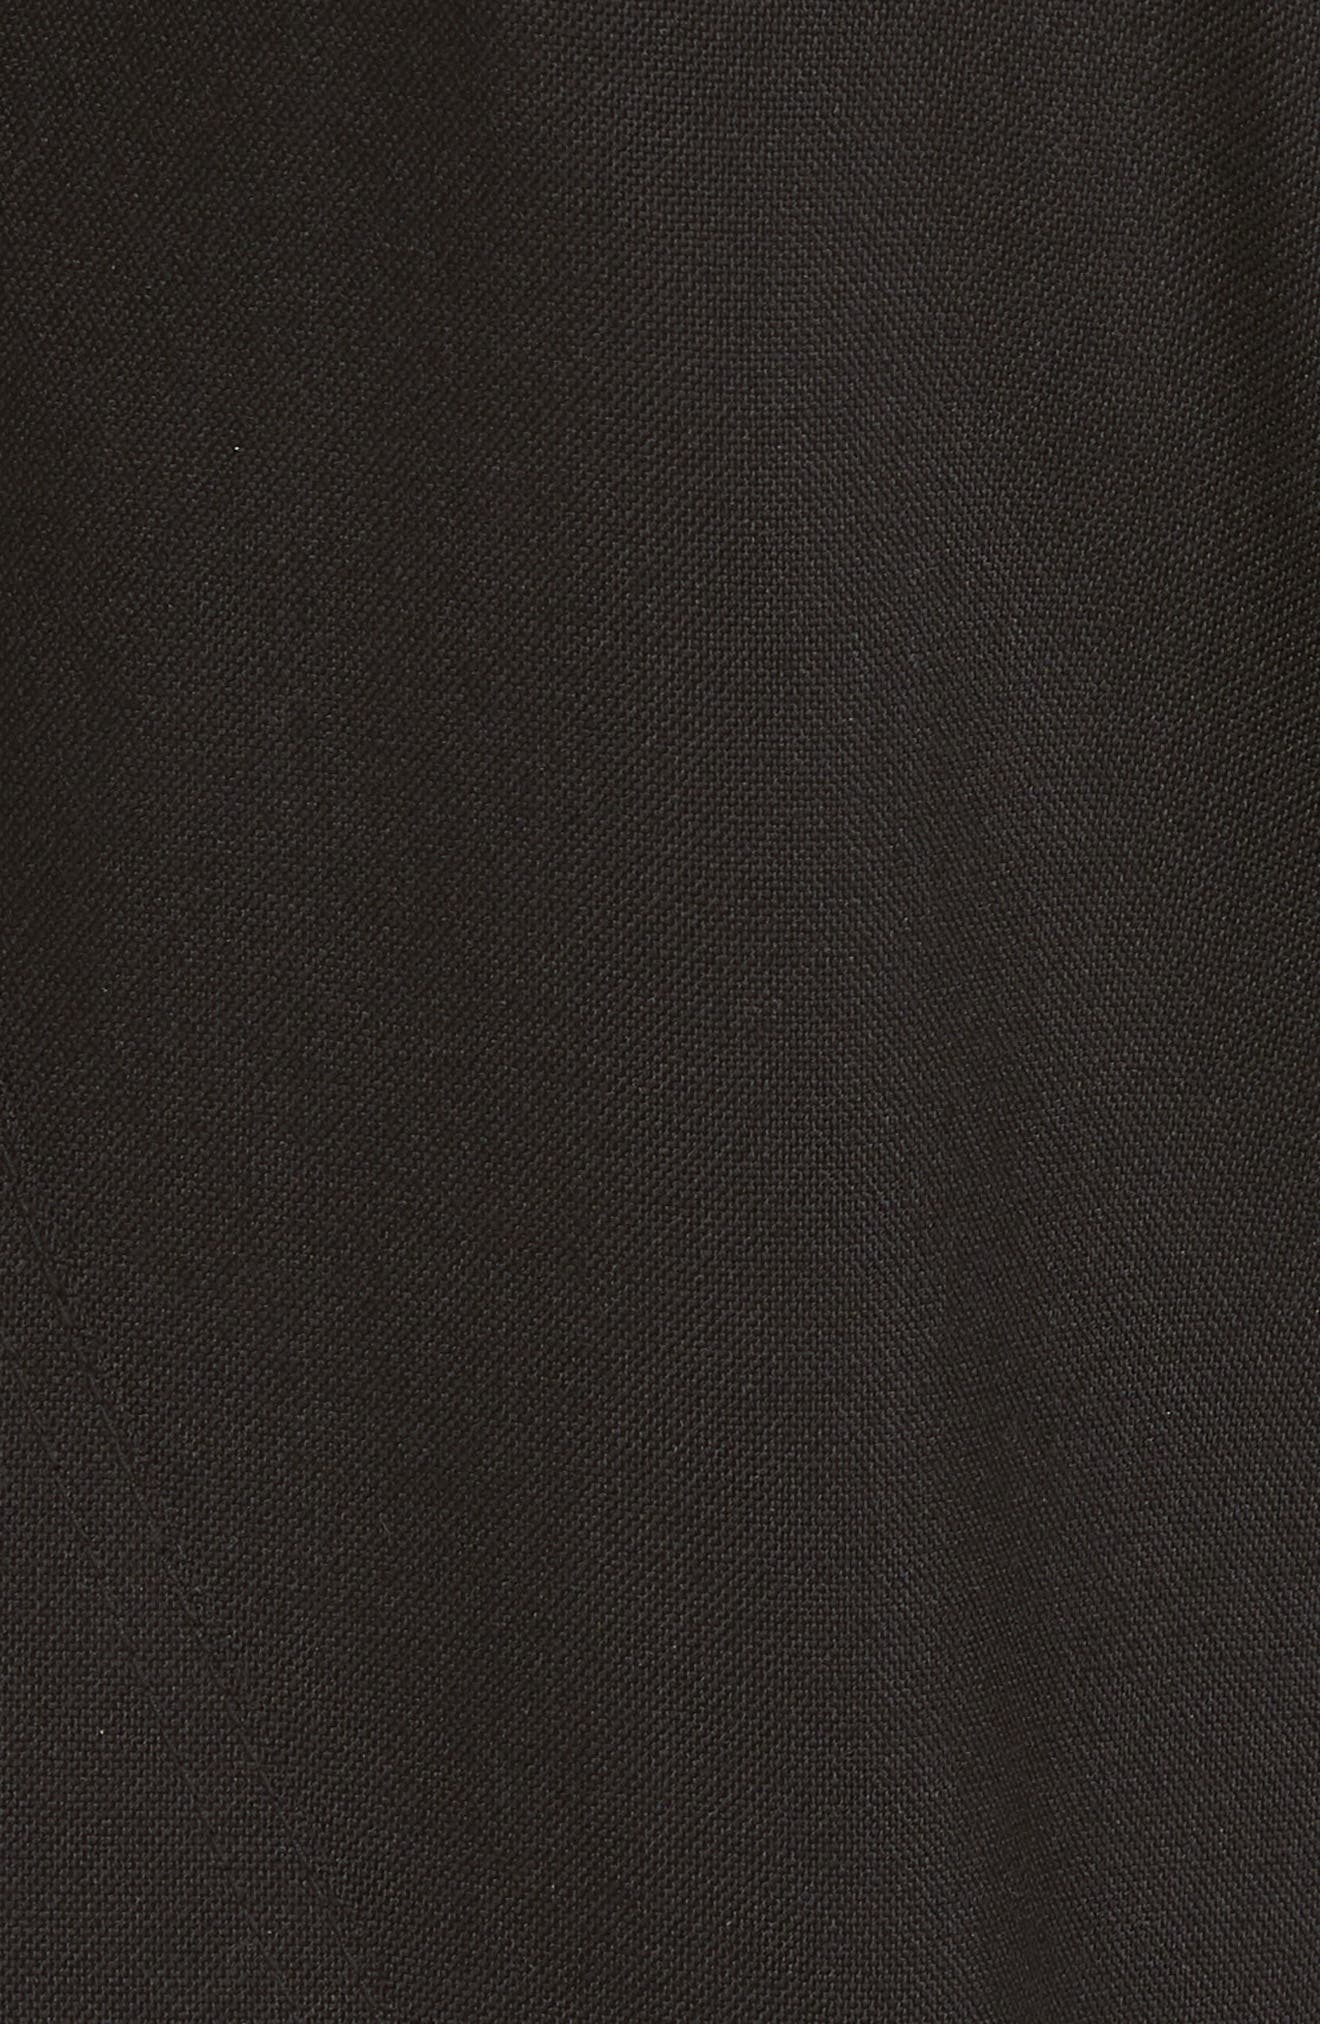 Wool & Mohair Biker Pants,                             Alternate thumbnail 5, color,                             BLACK